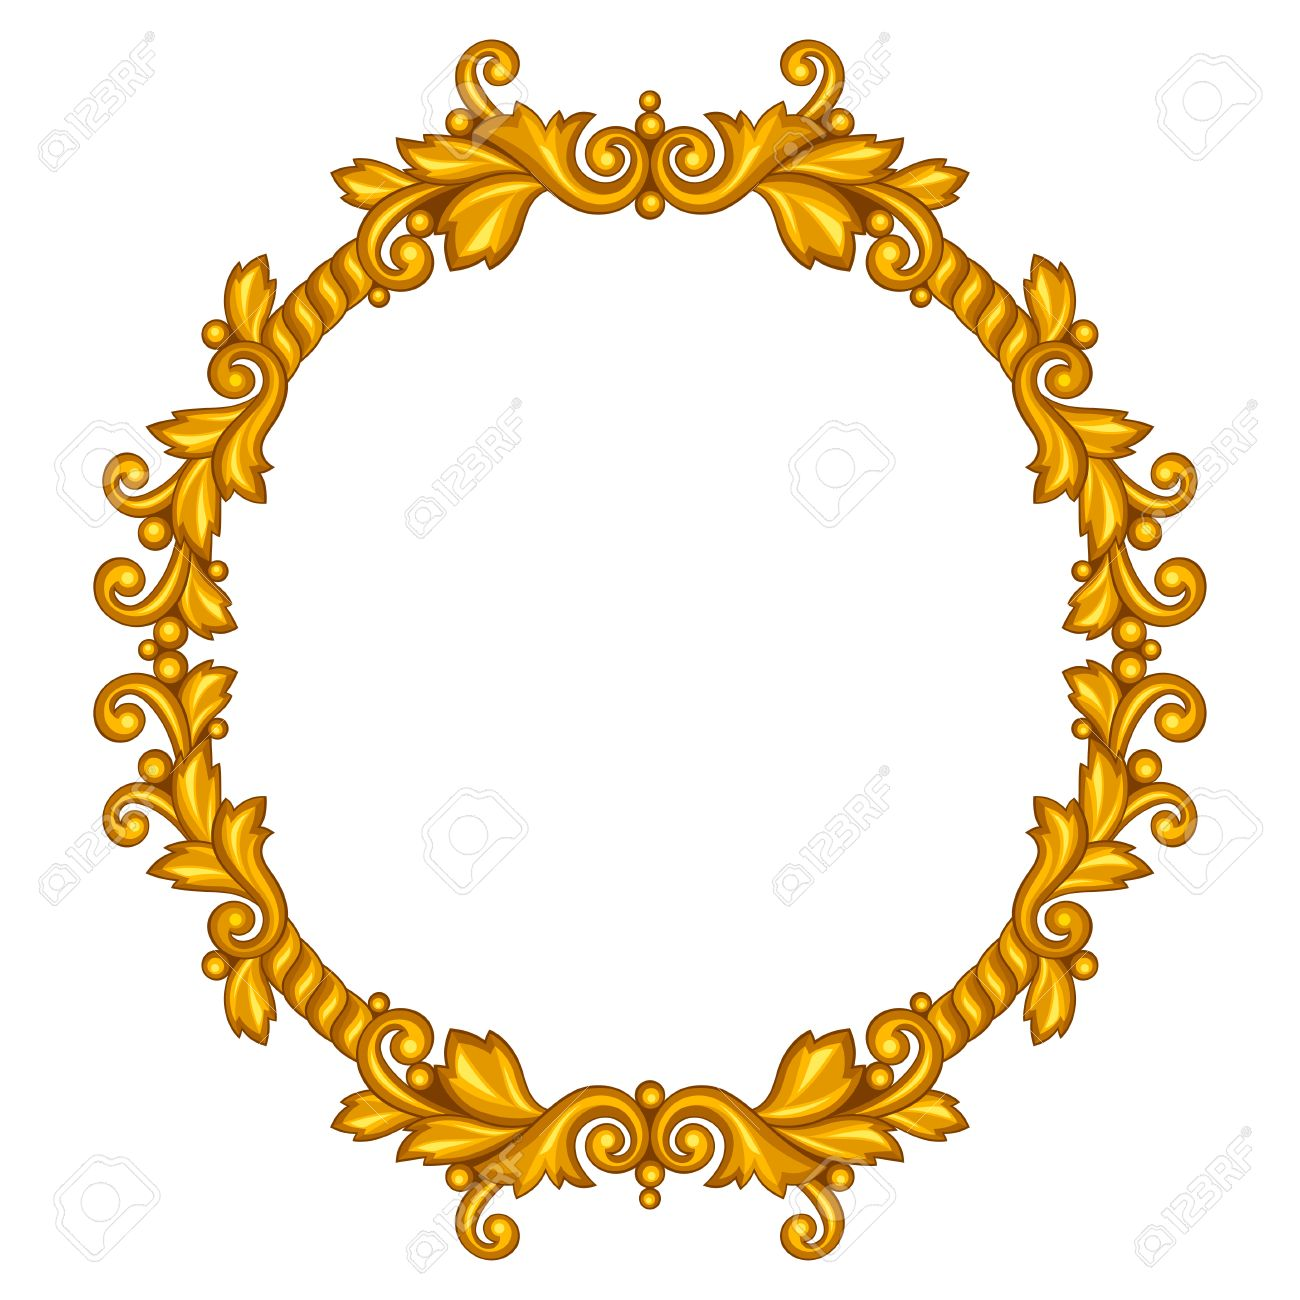 1300x1300 Decorative Line Gold Clipart Baroque